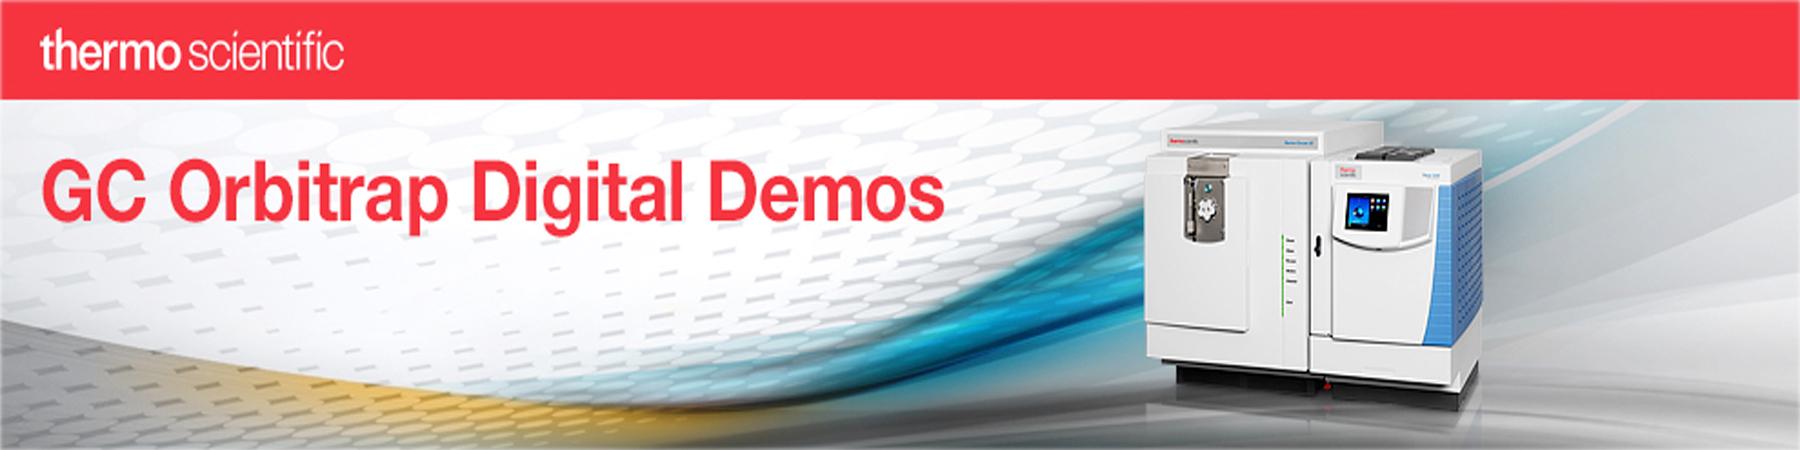 slide-GC-Orbitrap-demo